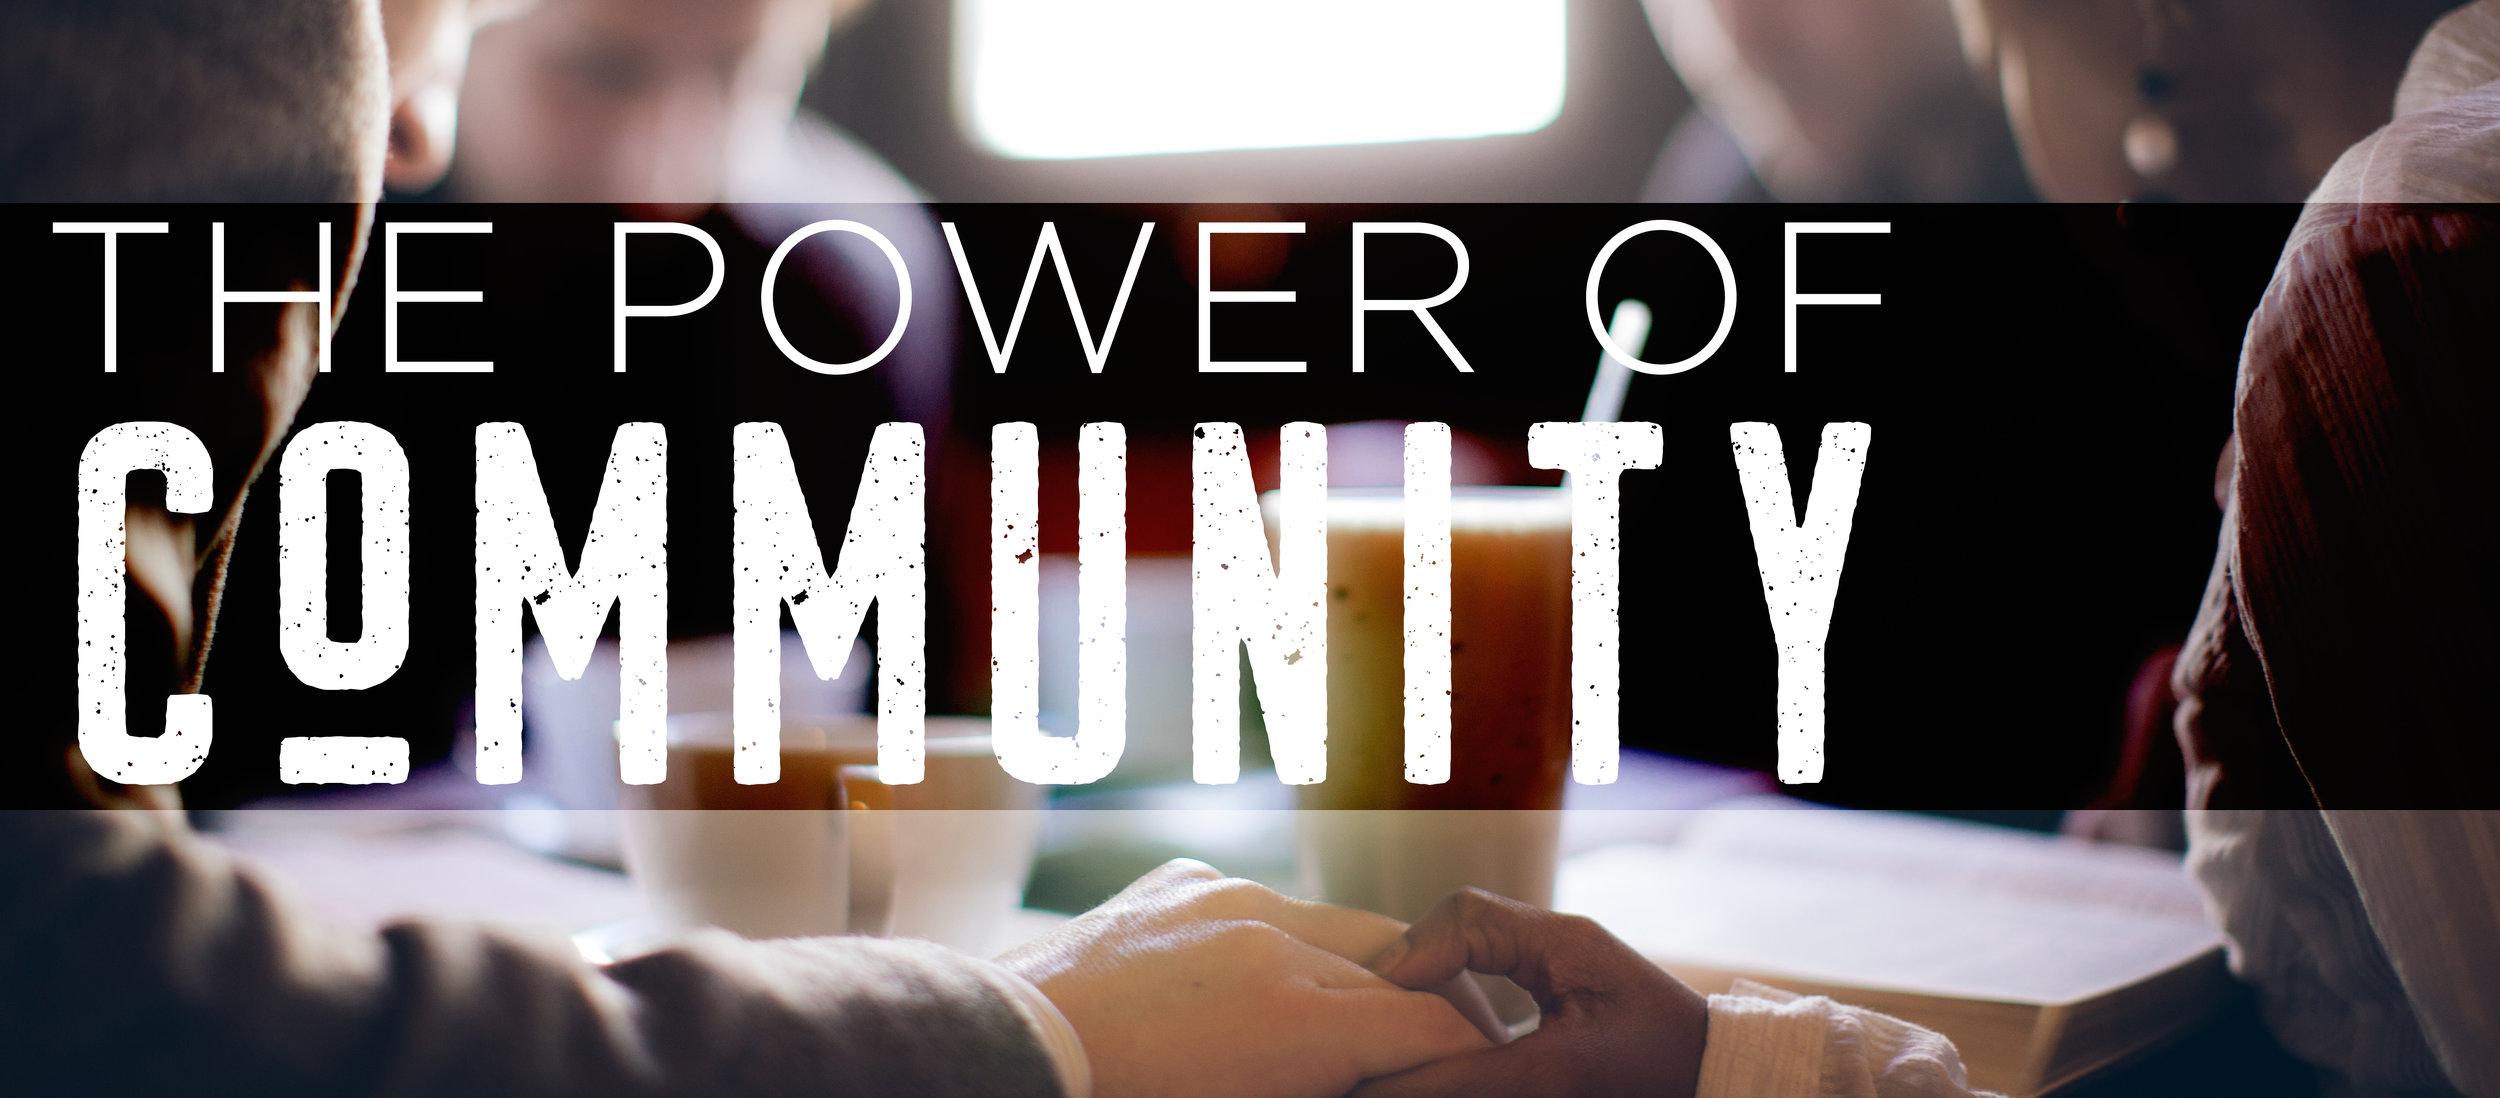 thepowerofcommunitybanner.jpg